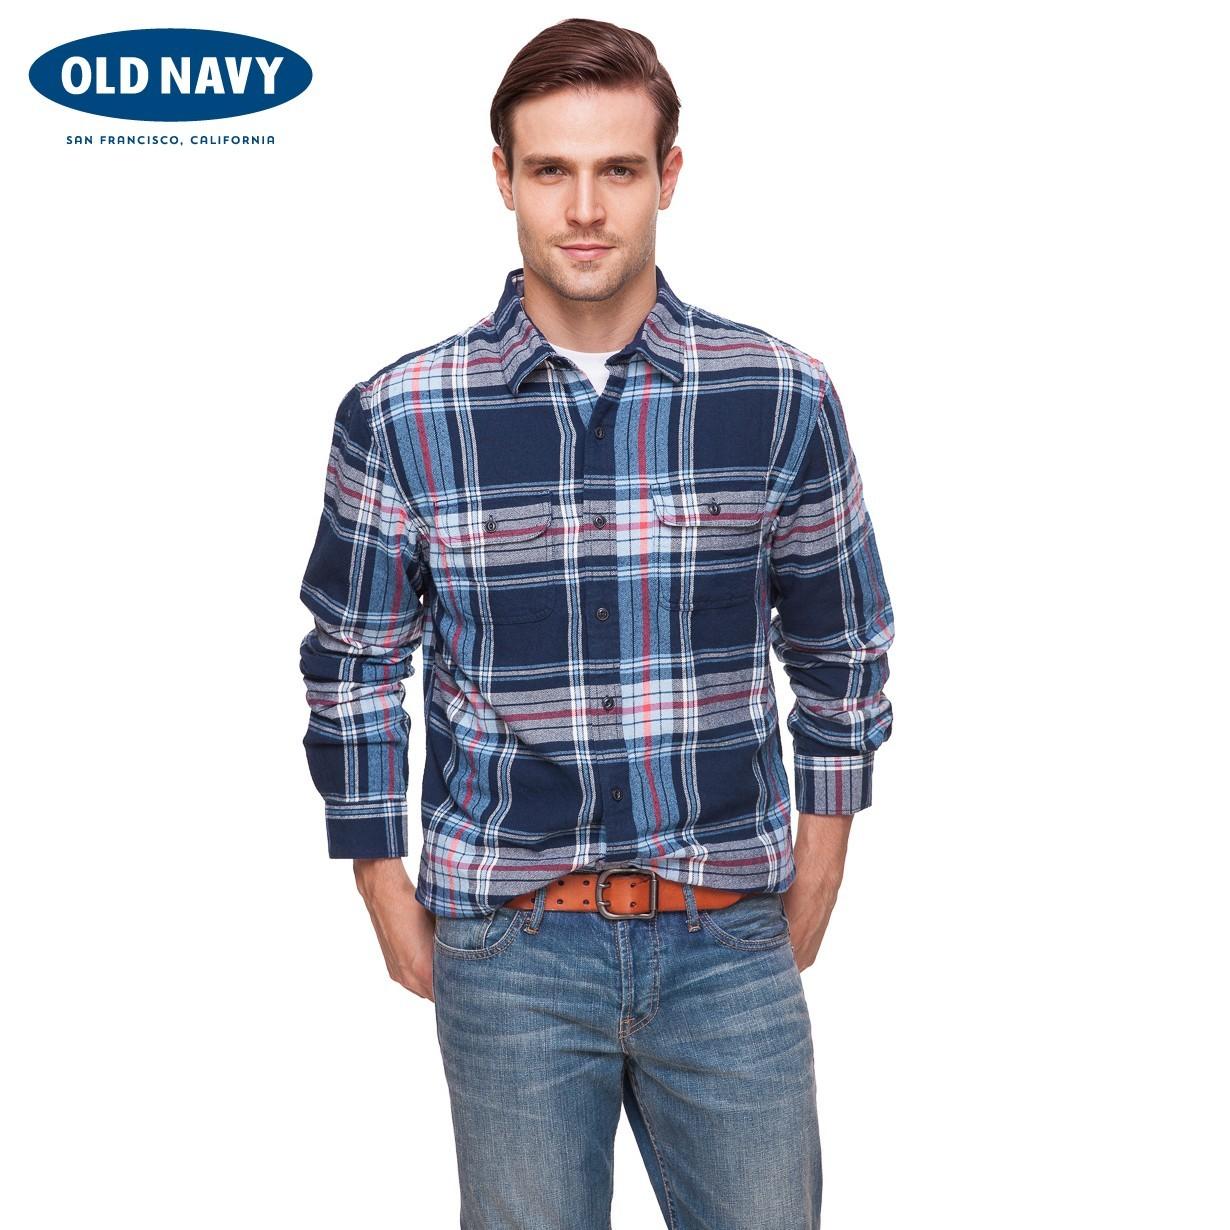 Рубашка мужская OLD NAVY 000119313 119313 рубашка мужская old navy 000438245 438245